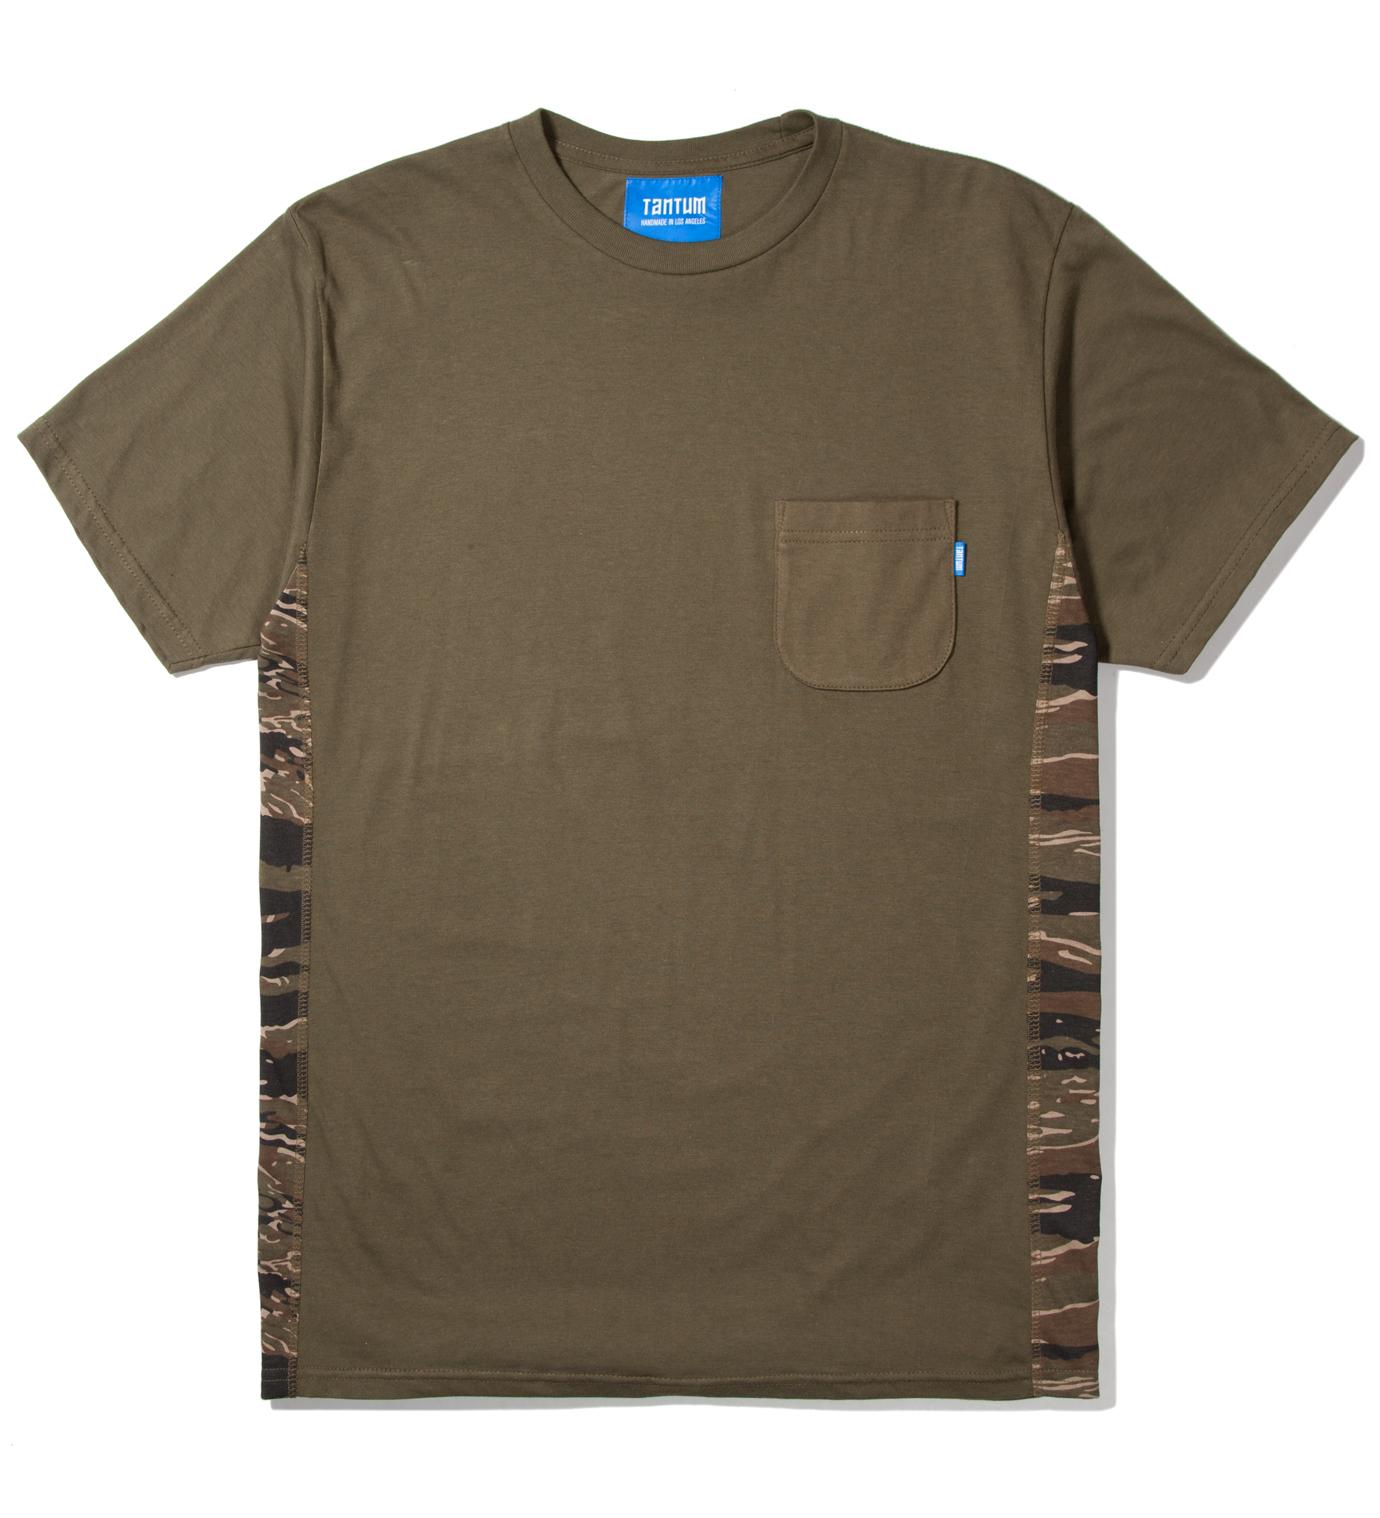 Tantum Olive Side Panel Tiger Stripe Camo T-Shirt